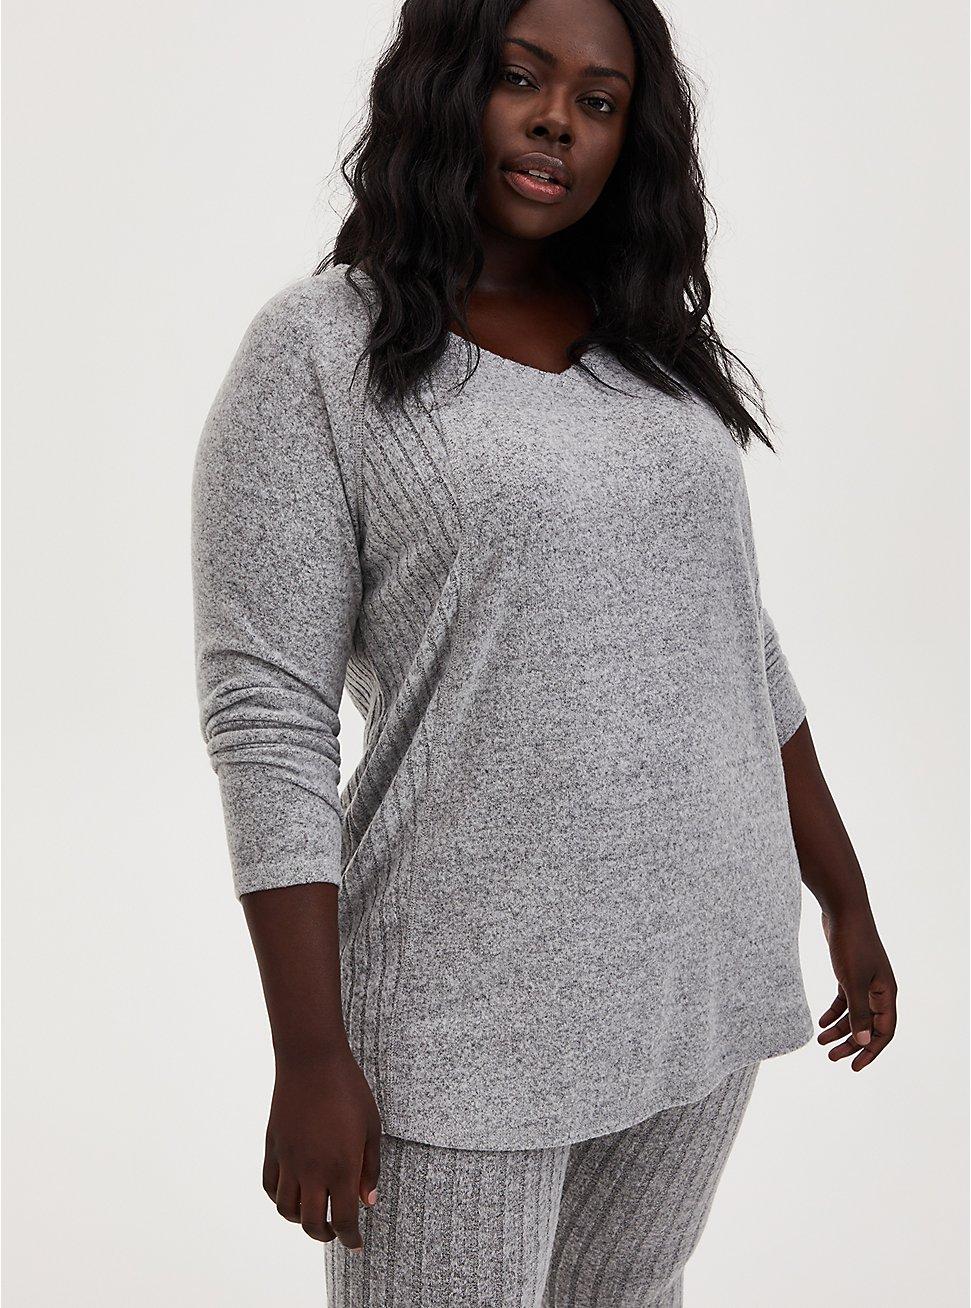 Super Soft Plush Light Grey Long Sleeve Sleep Tee, GREY, hi-res